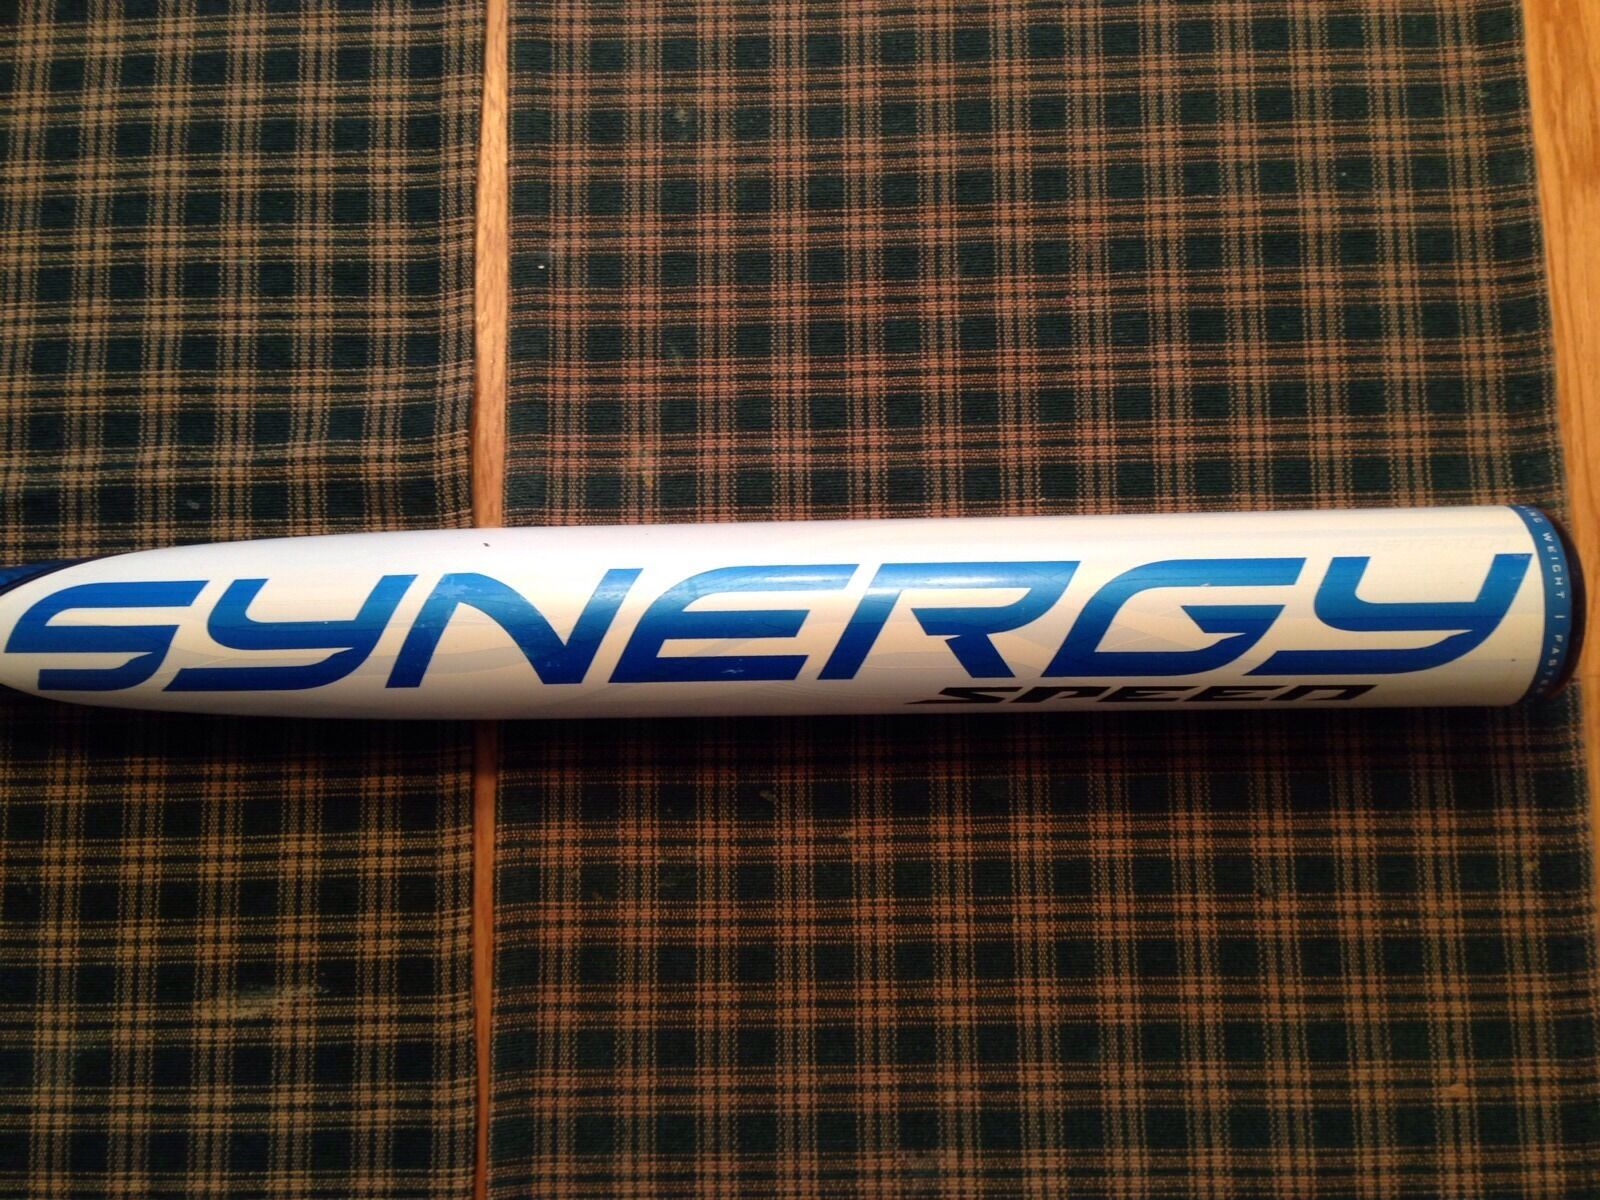 RARE USED Easton SYNERGY Speed SRV4B Fastpitch Softball Bat 34 24 (-10) ASA